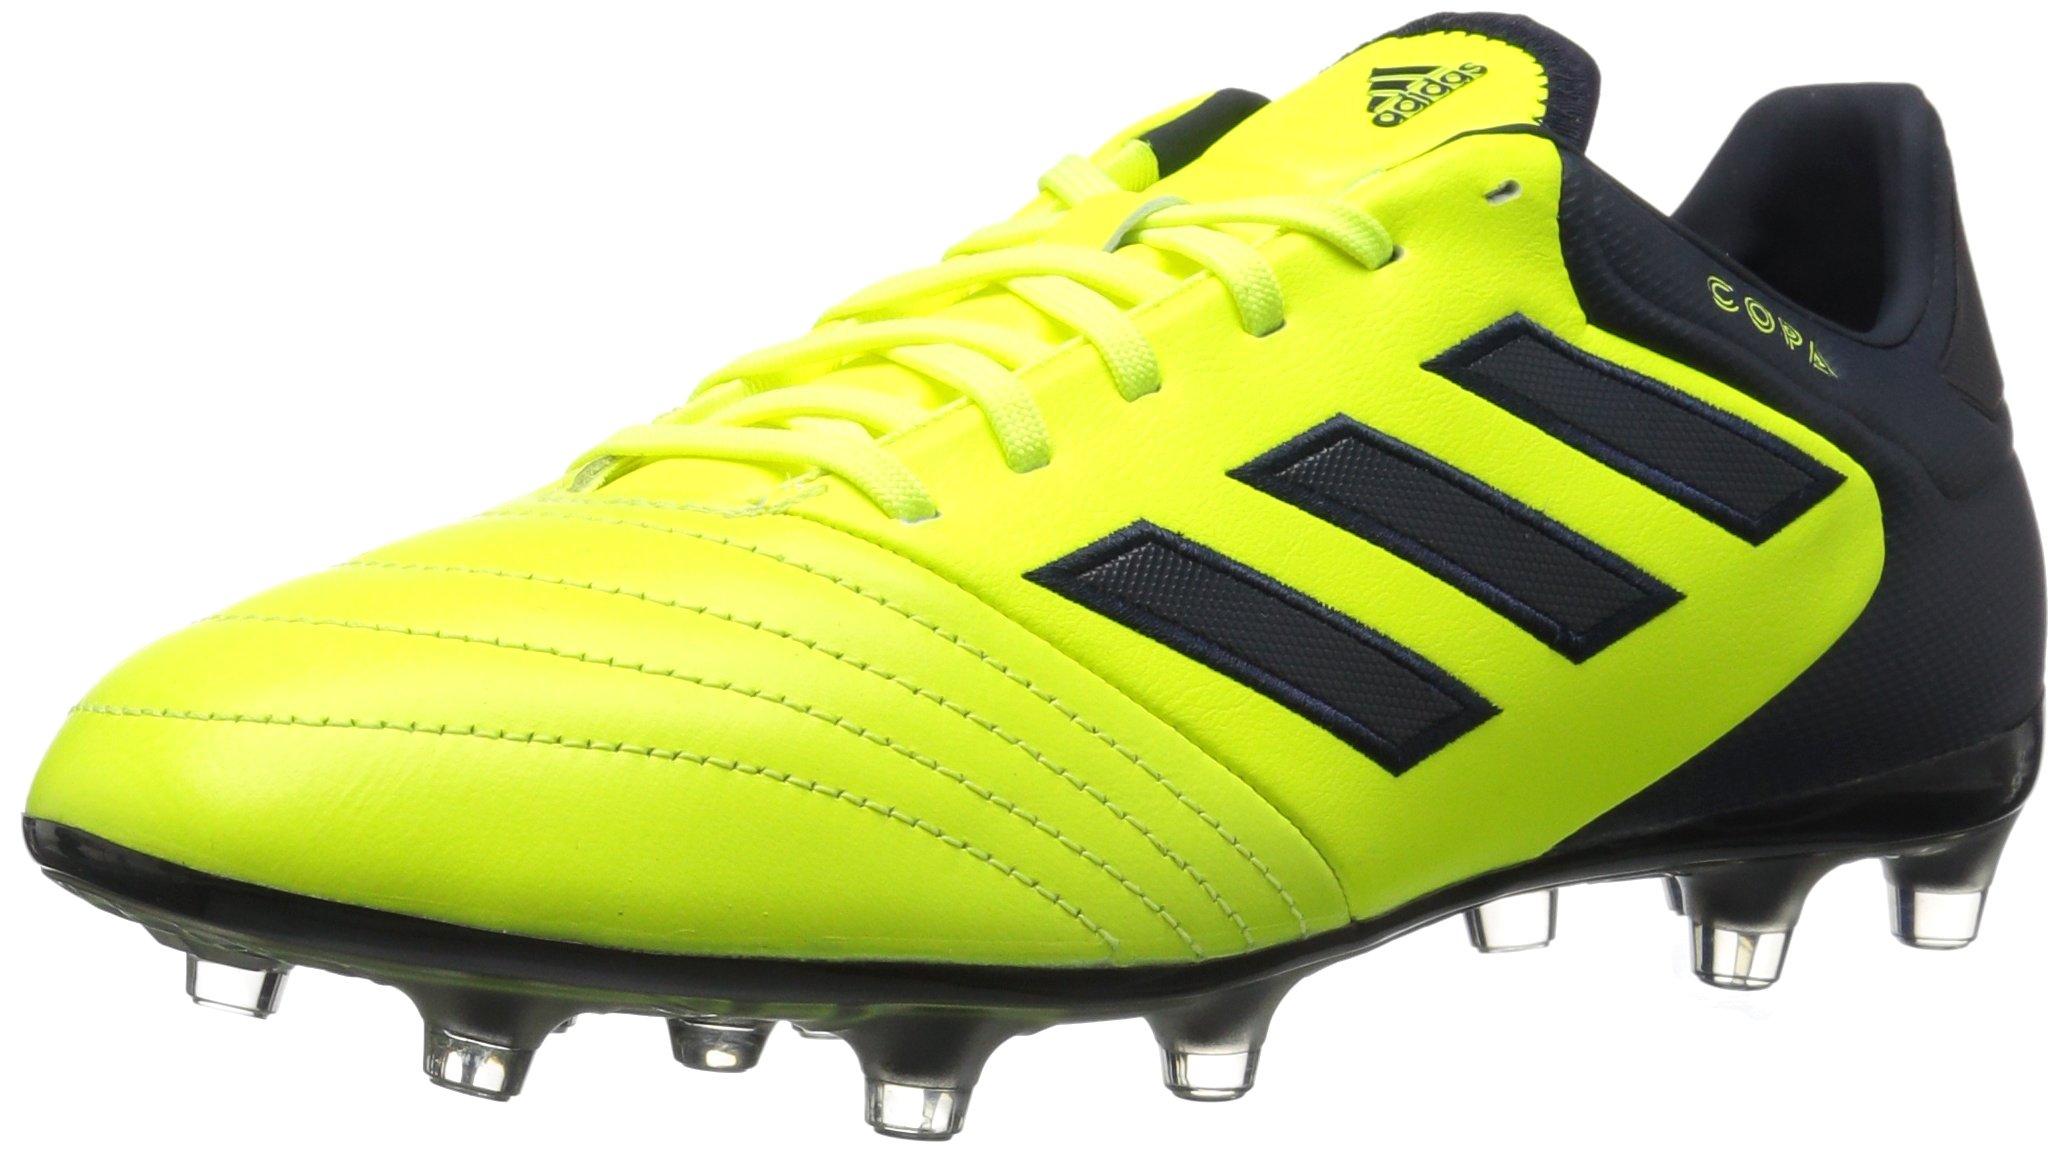 adidas Men's Copa 17.2 Firm Ground Cleats Soccer Shoe, Solar Yellow/Legend Ink/Legend Ink, (11 M US)